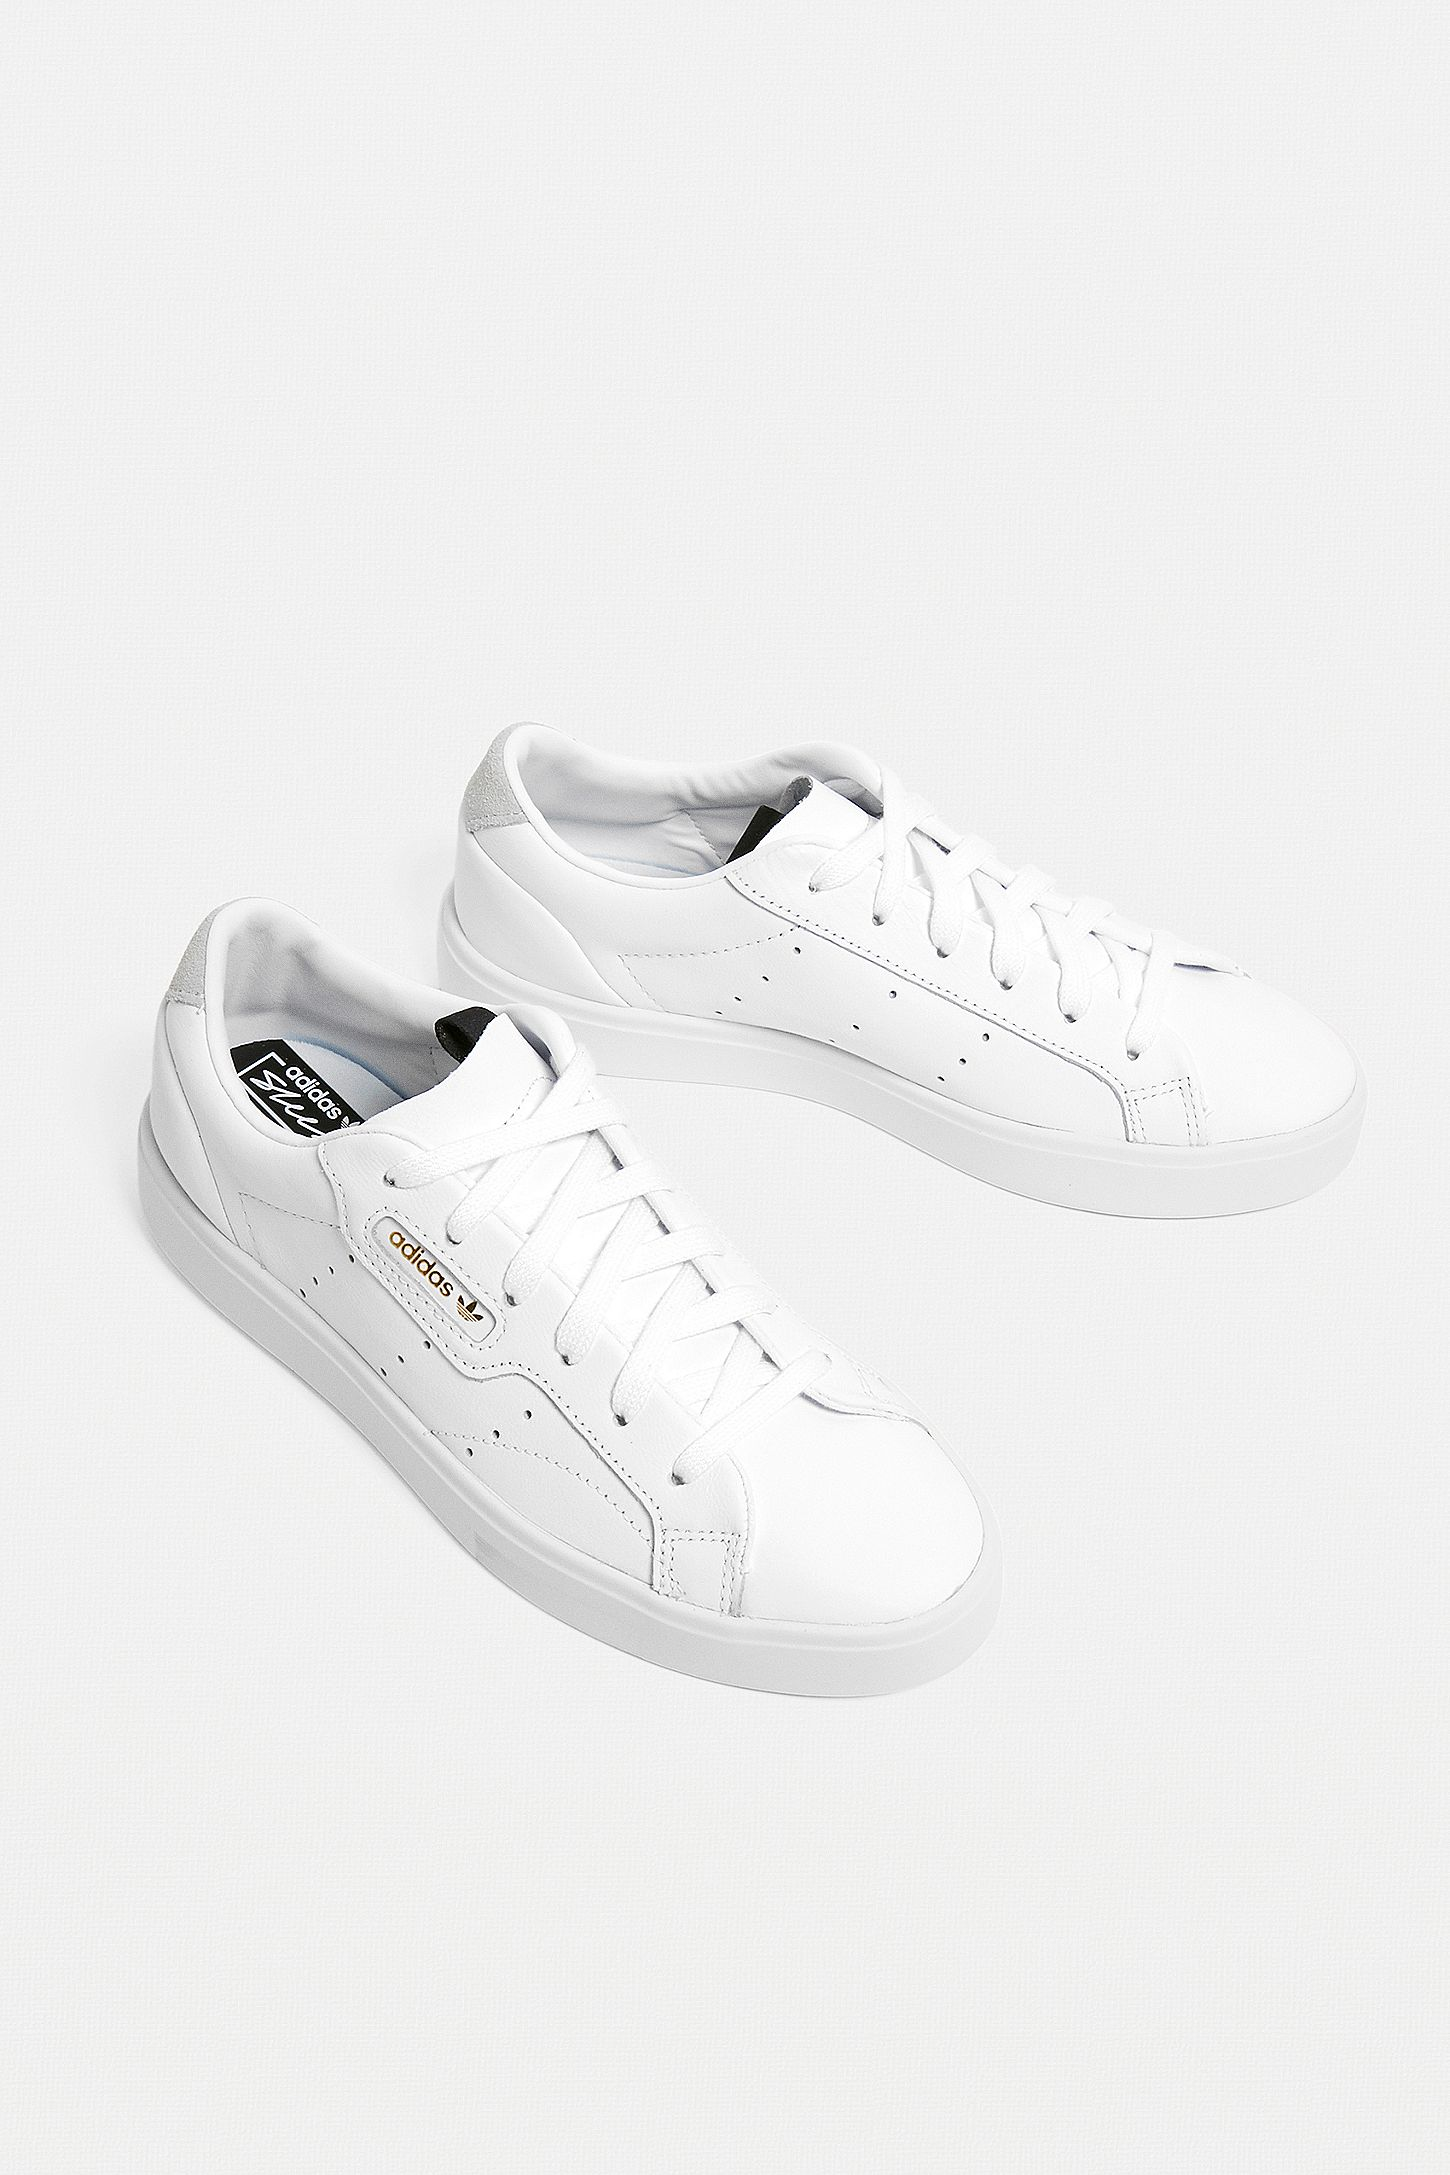 adidas Originals Sleek White Trainers